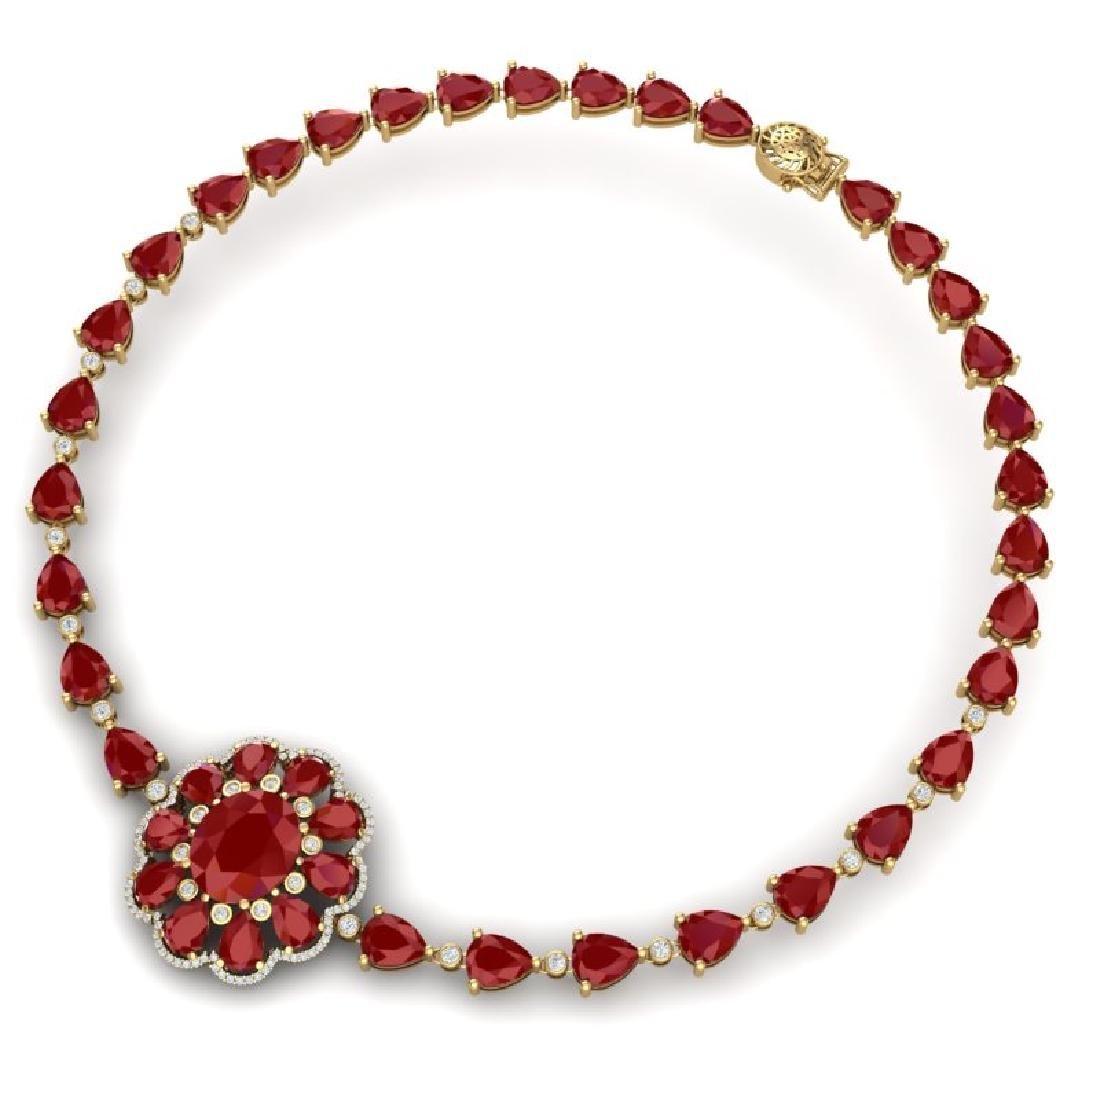 78.98 CTW Royalty Ruby & VS Diamond Necklace 18K Yellow - 3